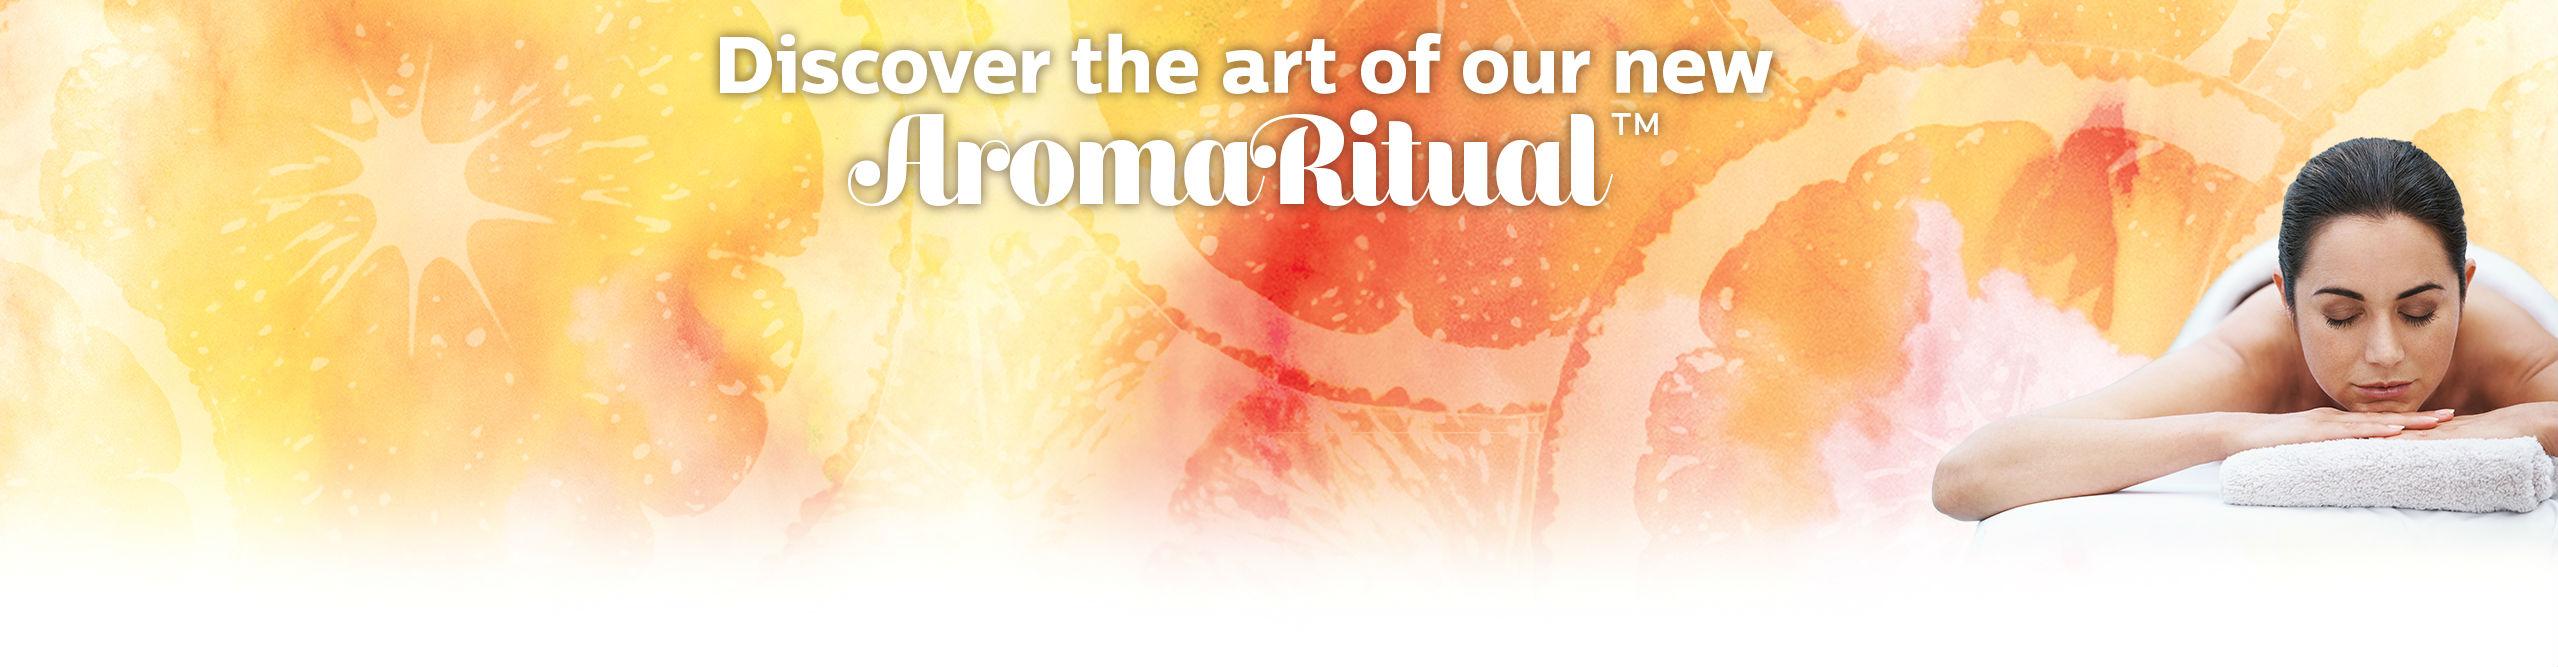 Aromaritual Studio Homepage